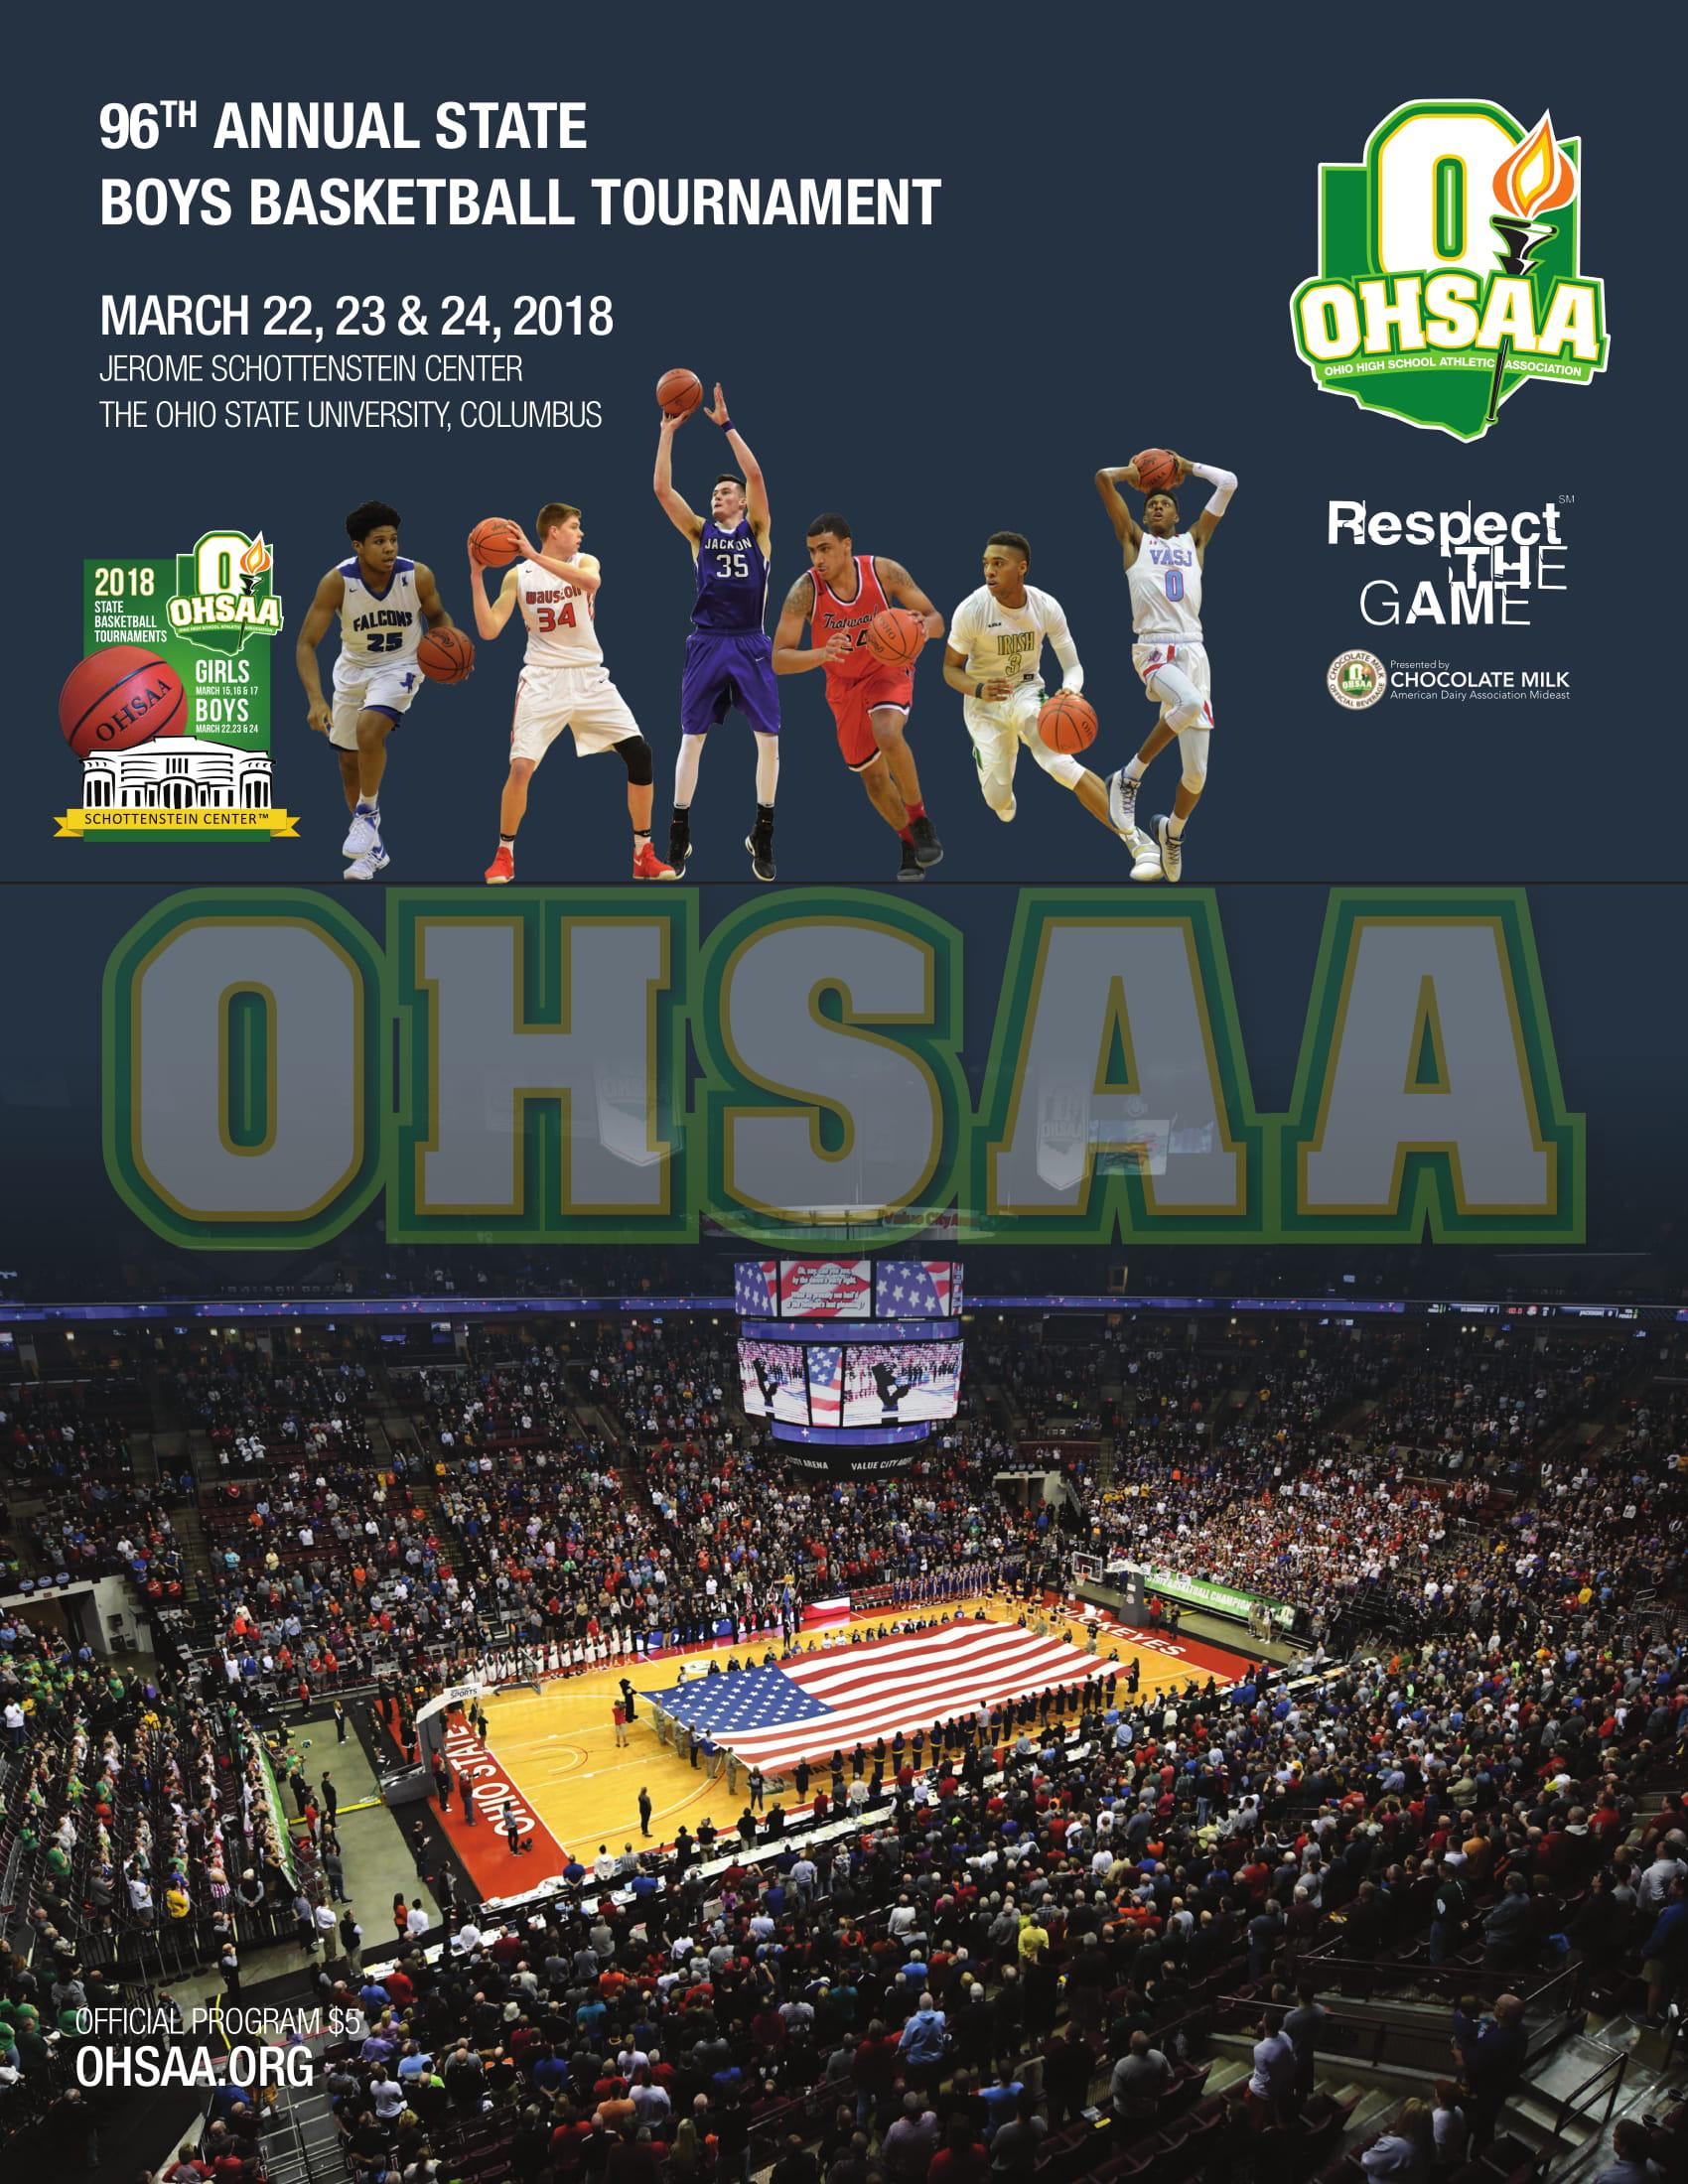 Boys Basketball Tournaments - ACA Hoops